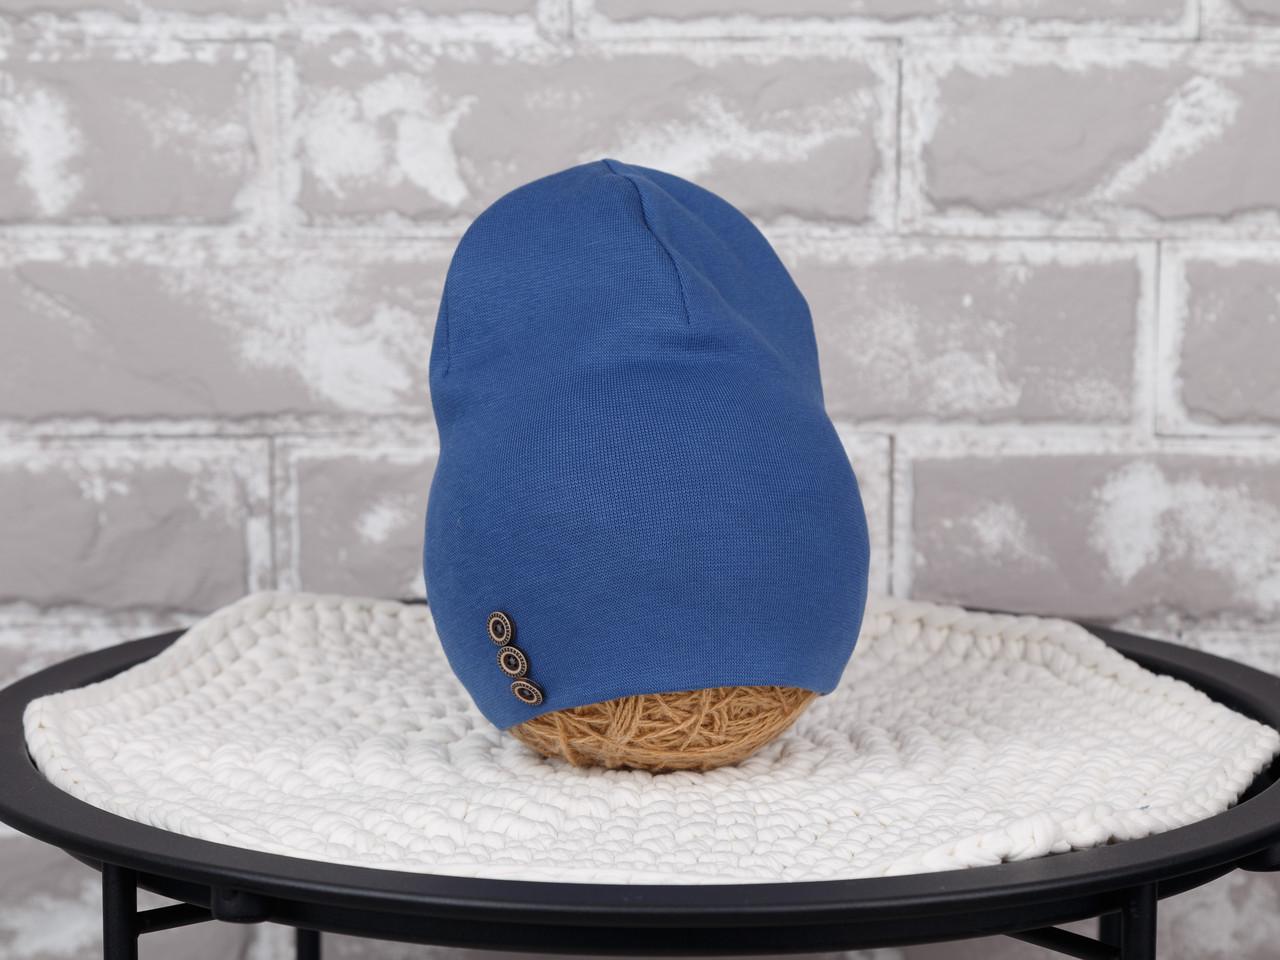 Шапочка с пуговками, синяя